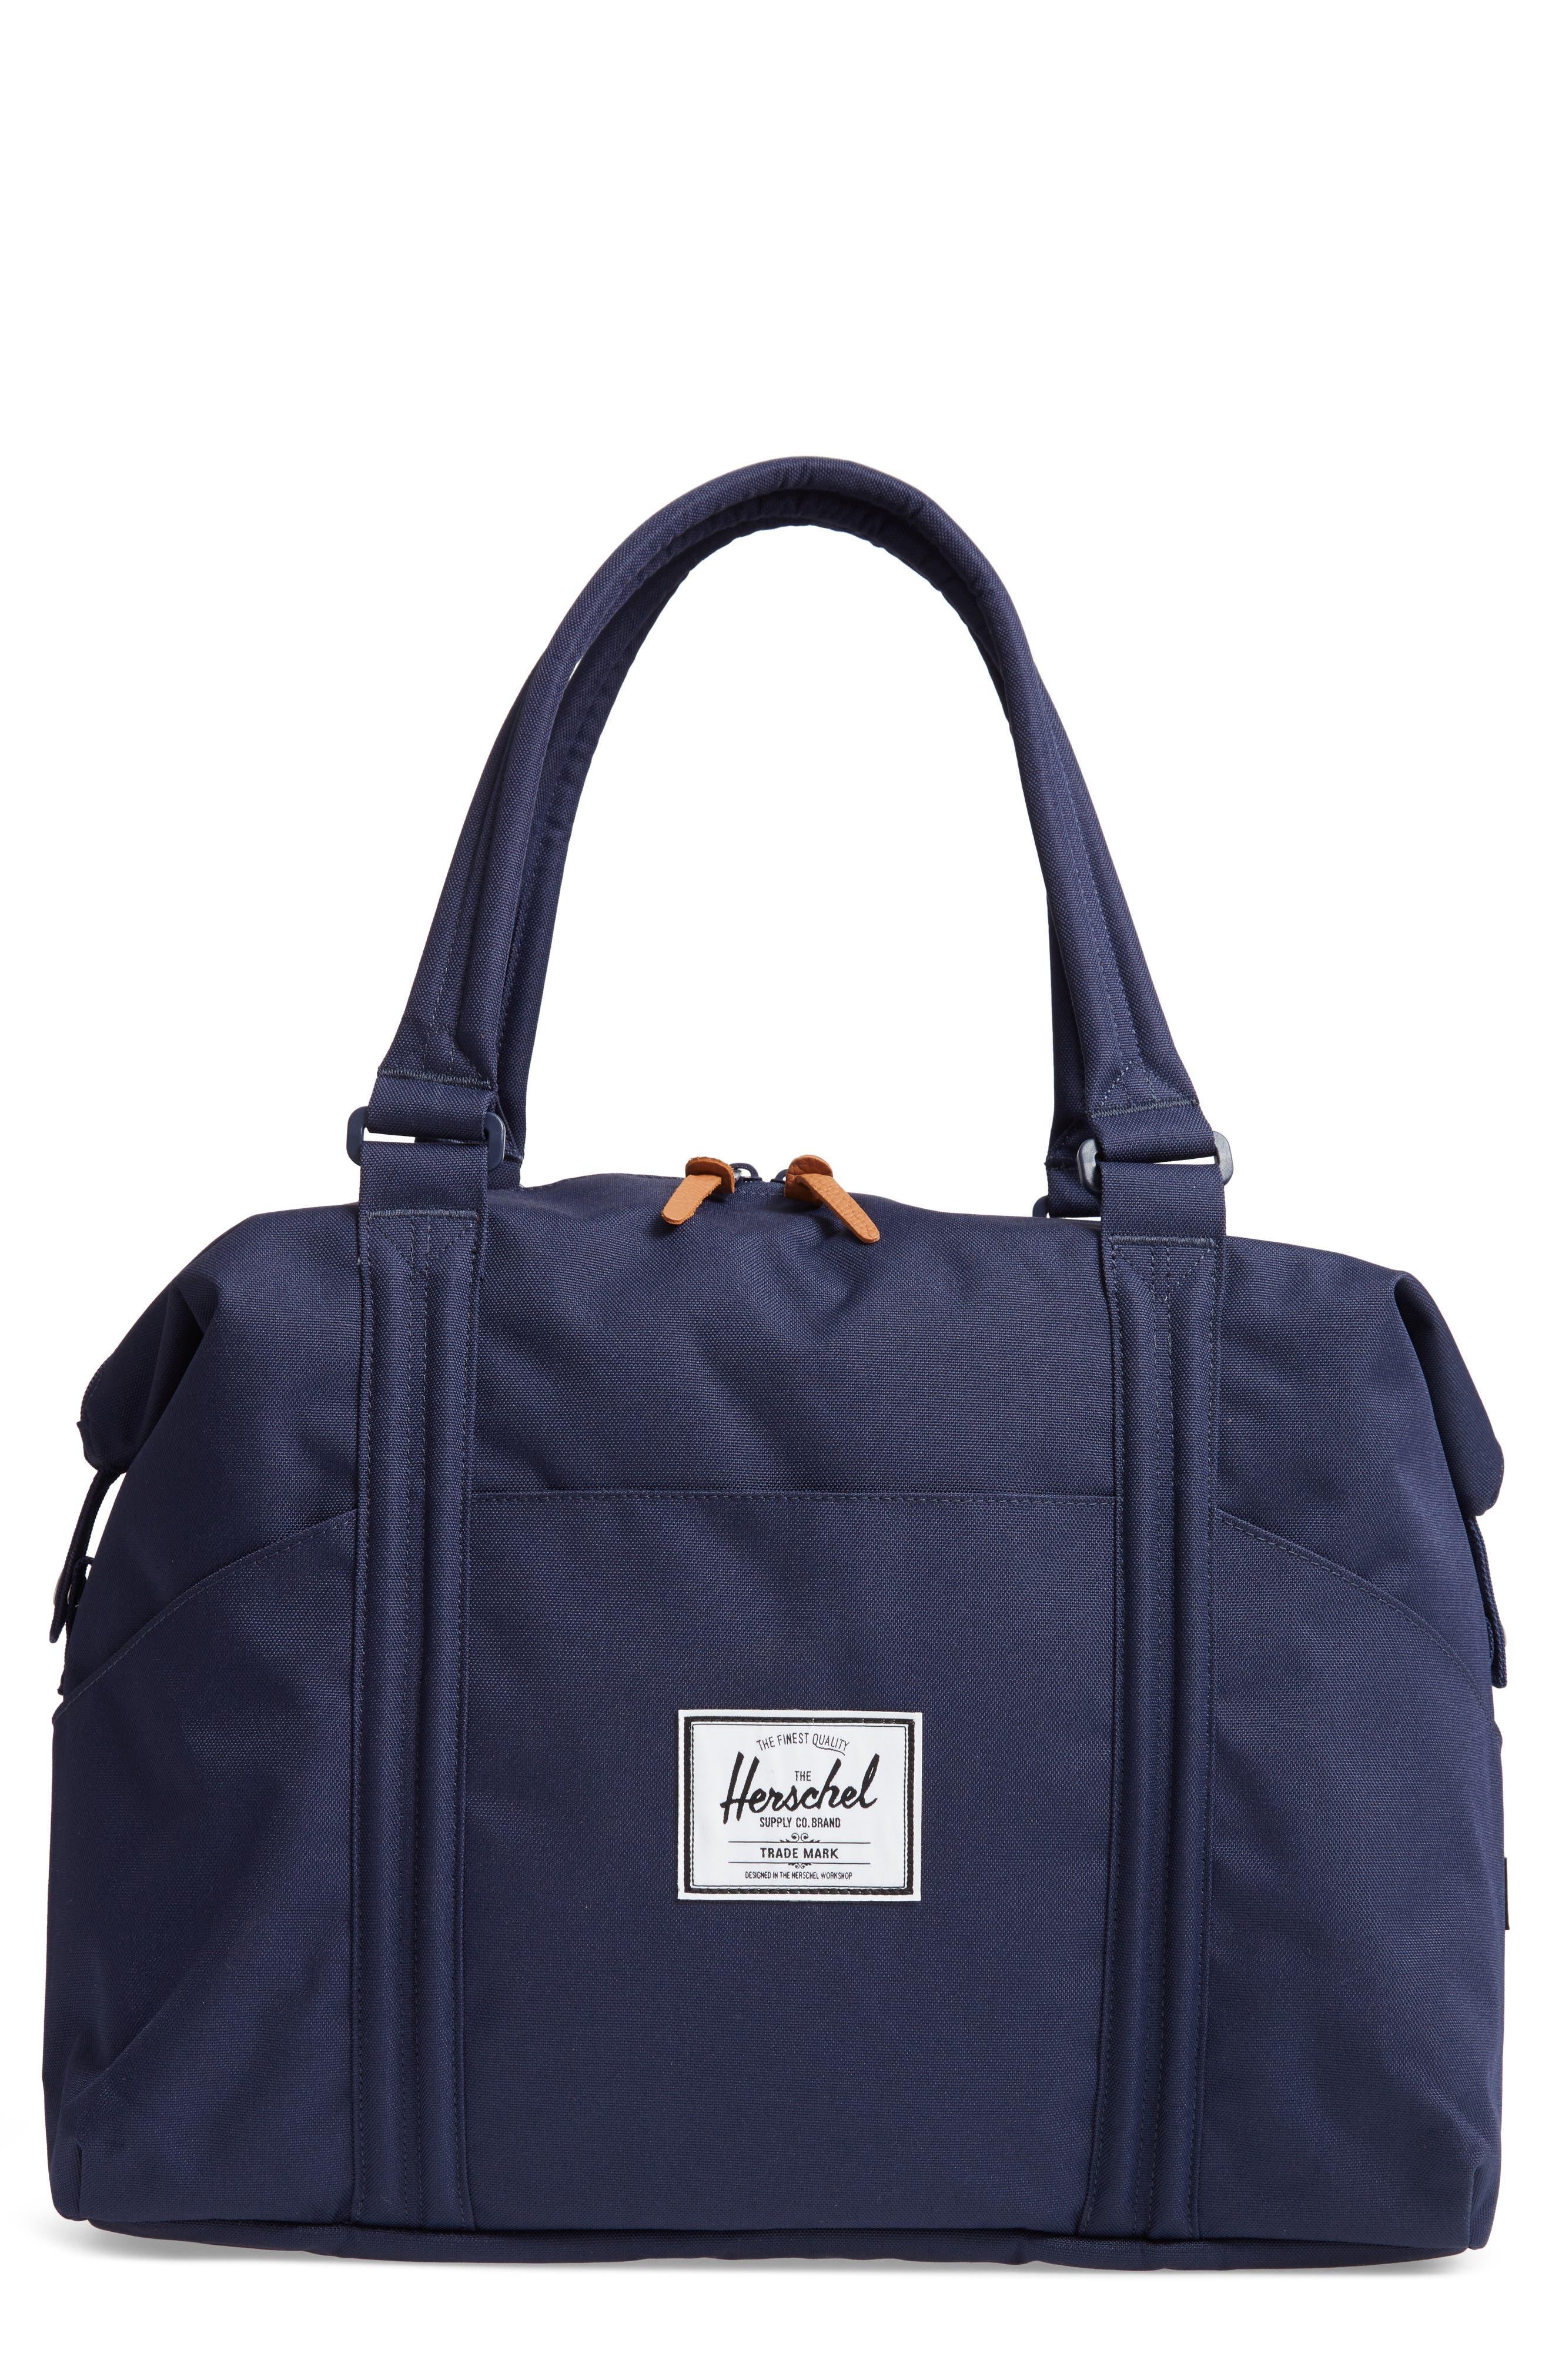 Strand Duffel Bag,                             Main thumbnail 1, color,                             PEACOAT